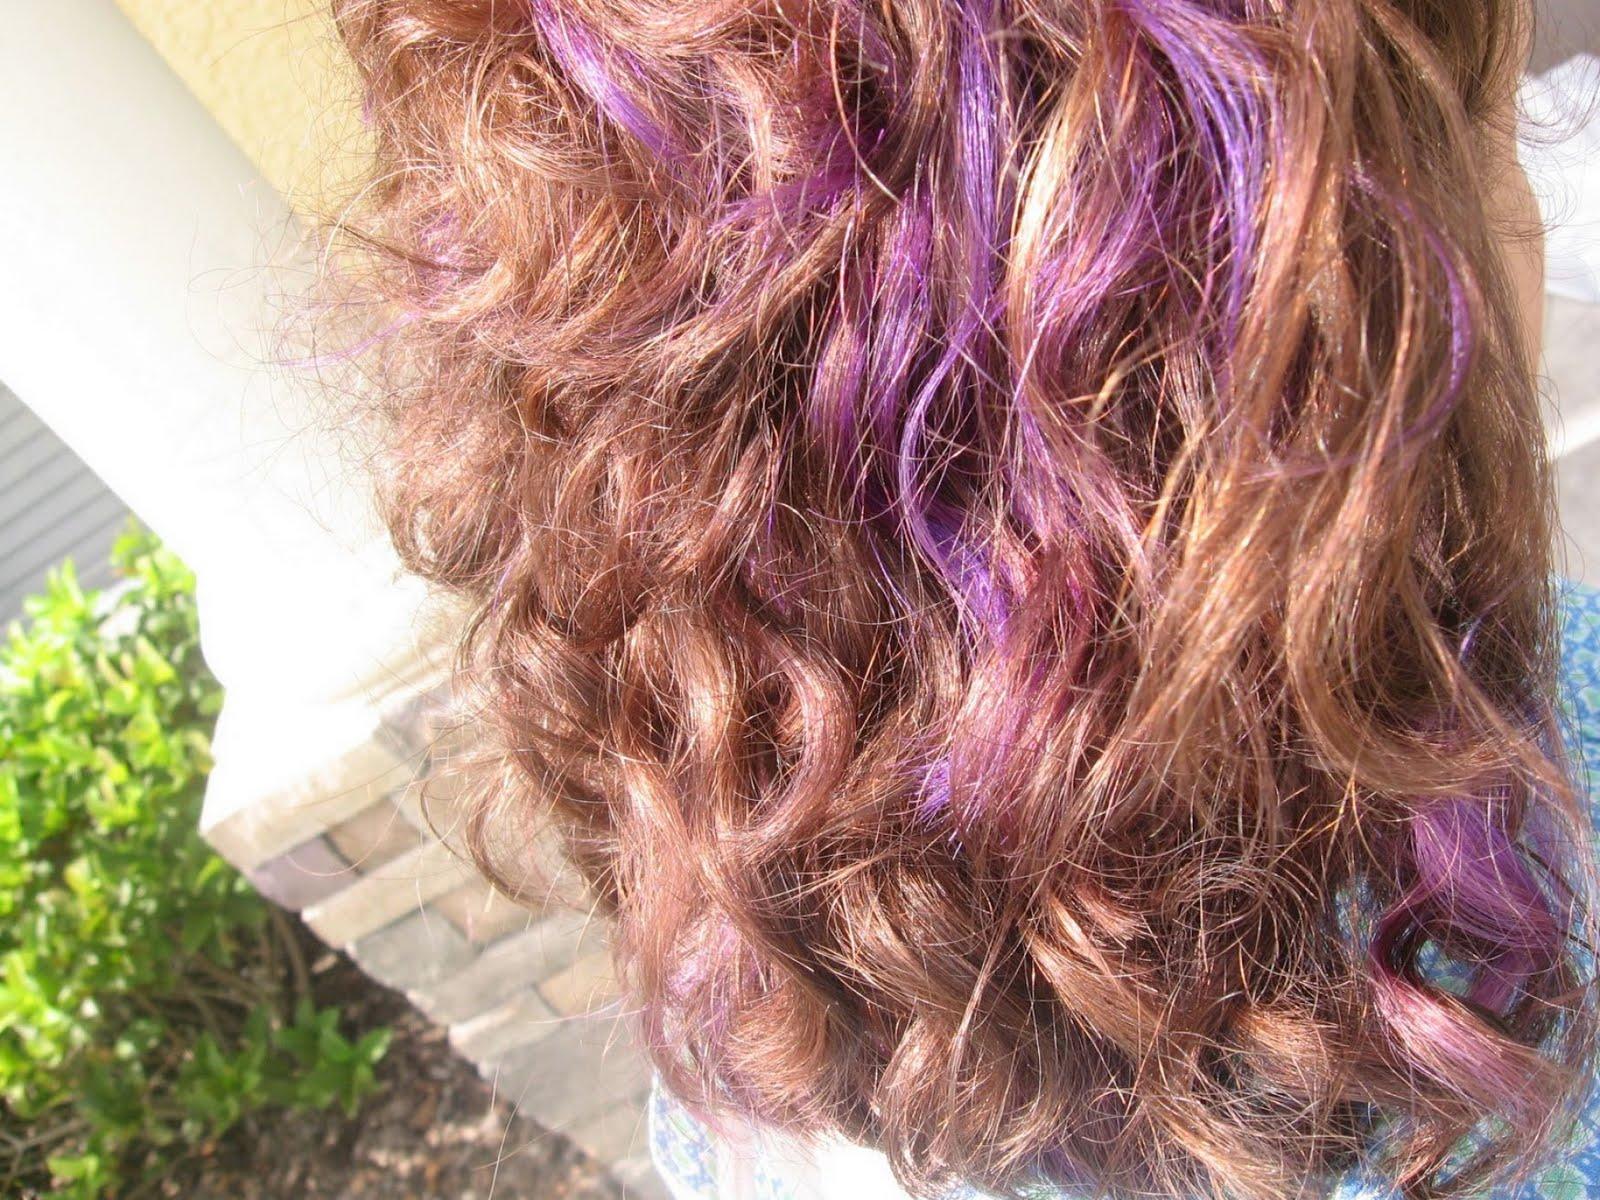 Video Justin Bieber: Girls With Purple Hair Highlights ...